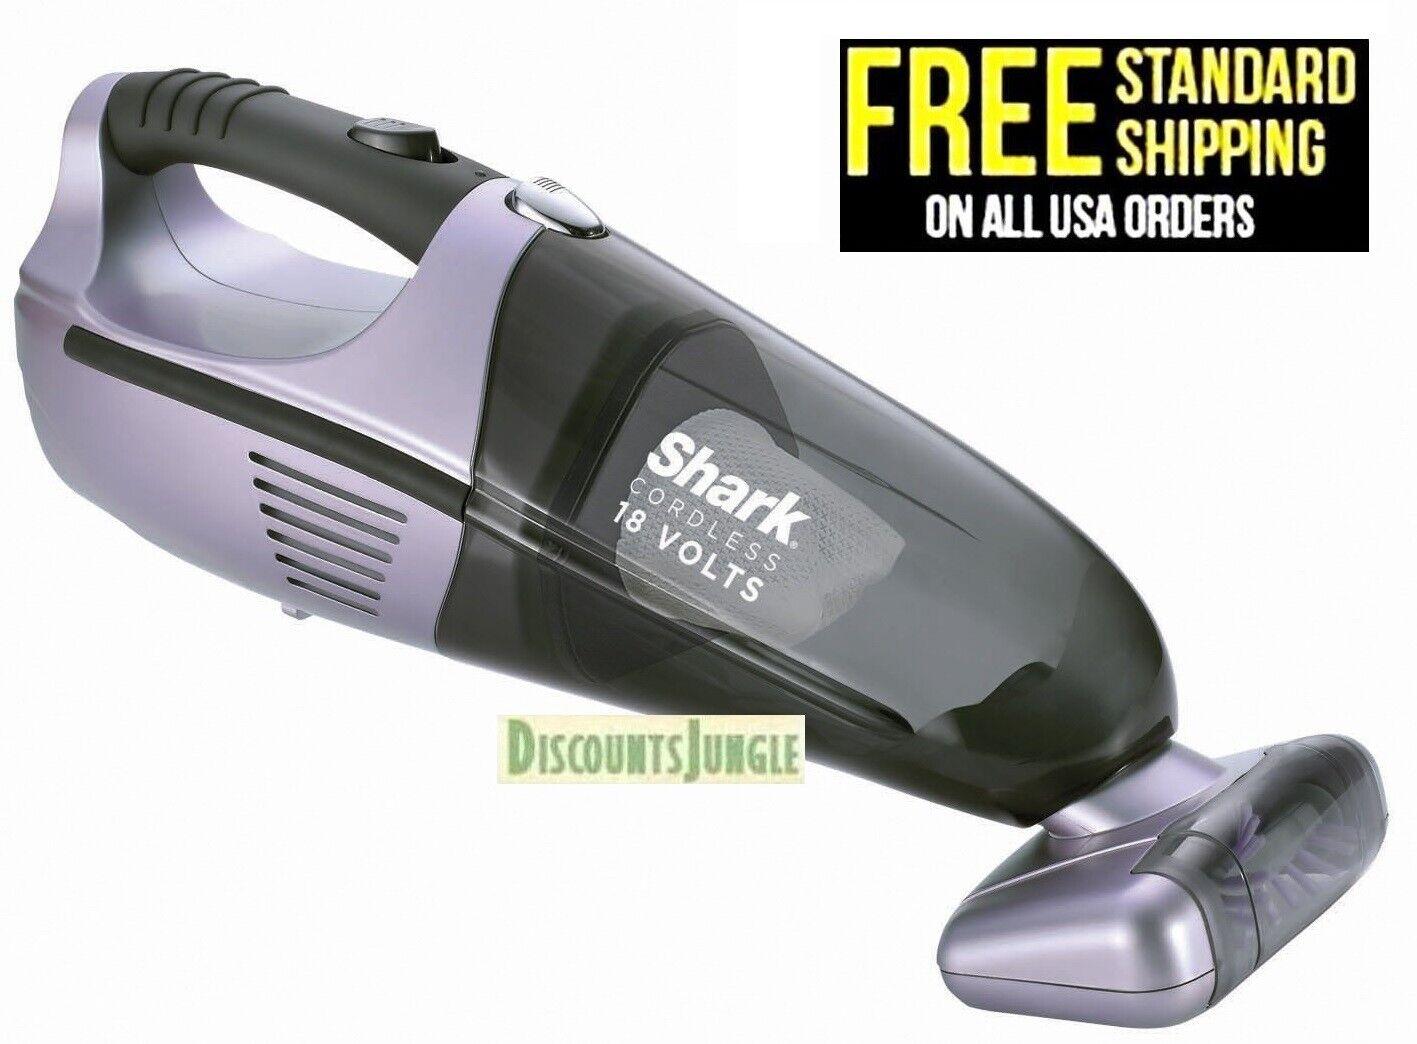 Shark SV780 Pet Perfect II cordless rechargeable Hand Vacuum